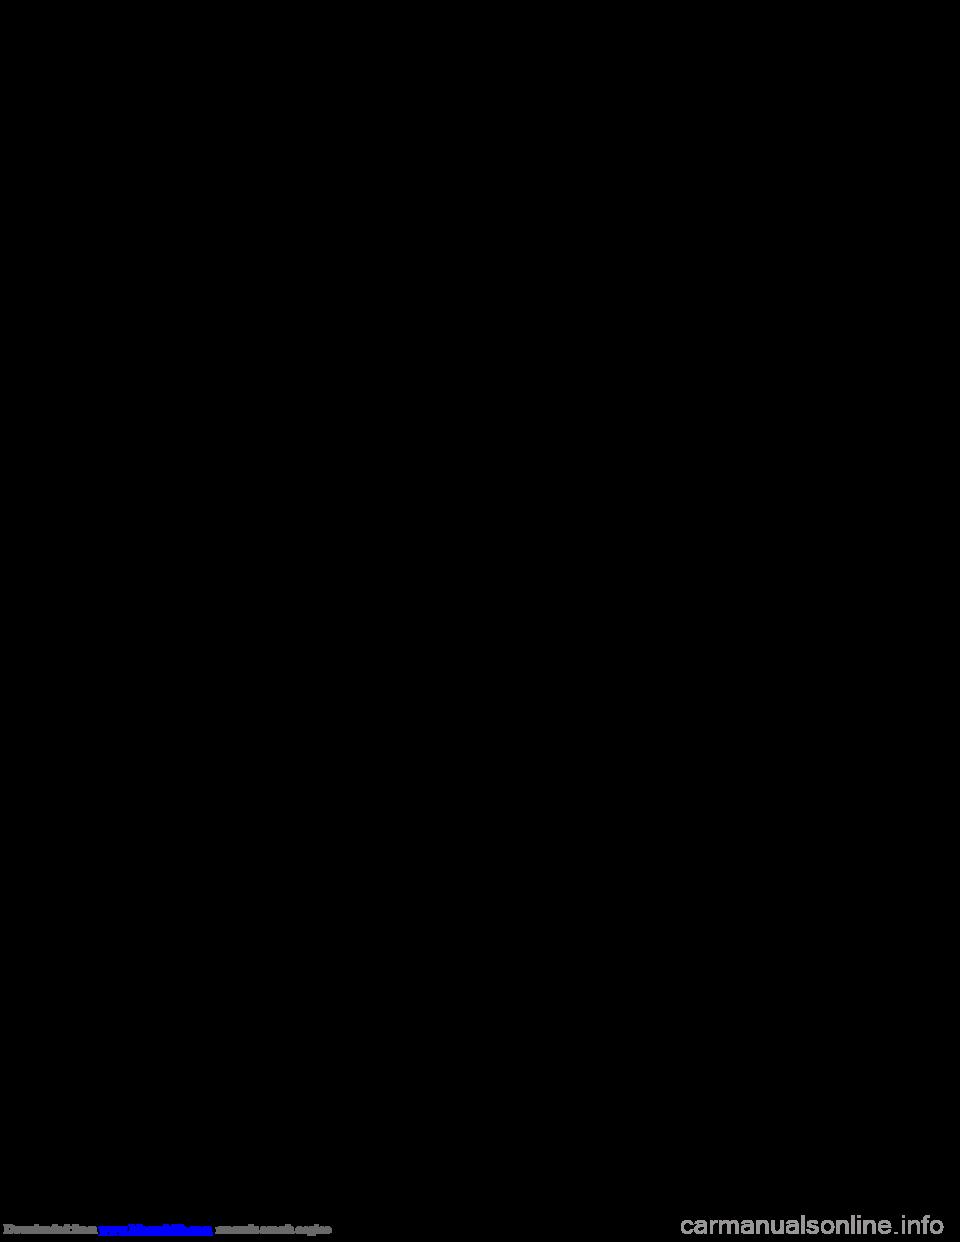 Heyunrei skoda octavia ii workshop manual pdf download free skoda fabia workshop manual image car workshop manual skoda octavia iii manualebook pdf skoda octavia workshop manual pdf verified book fandeluxe Choice Image